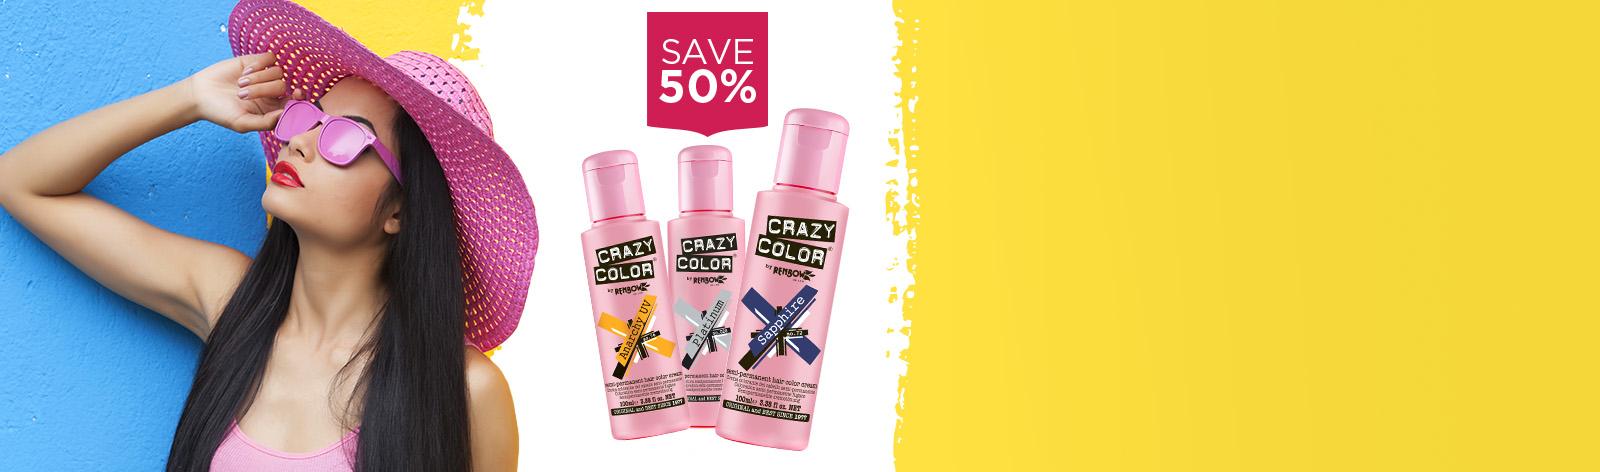 Save 50% on Crazy Colour Semi Permanent Hair Colour Cream and the Lash Tint Kit